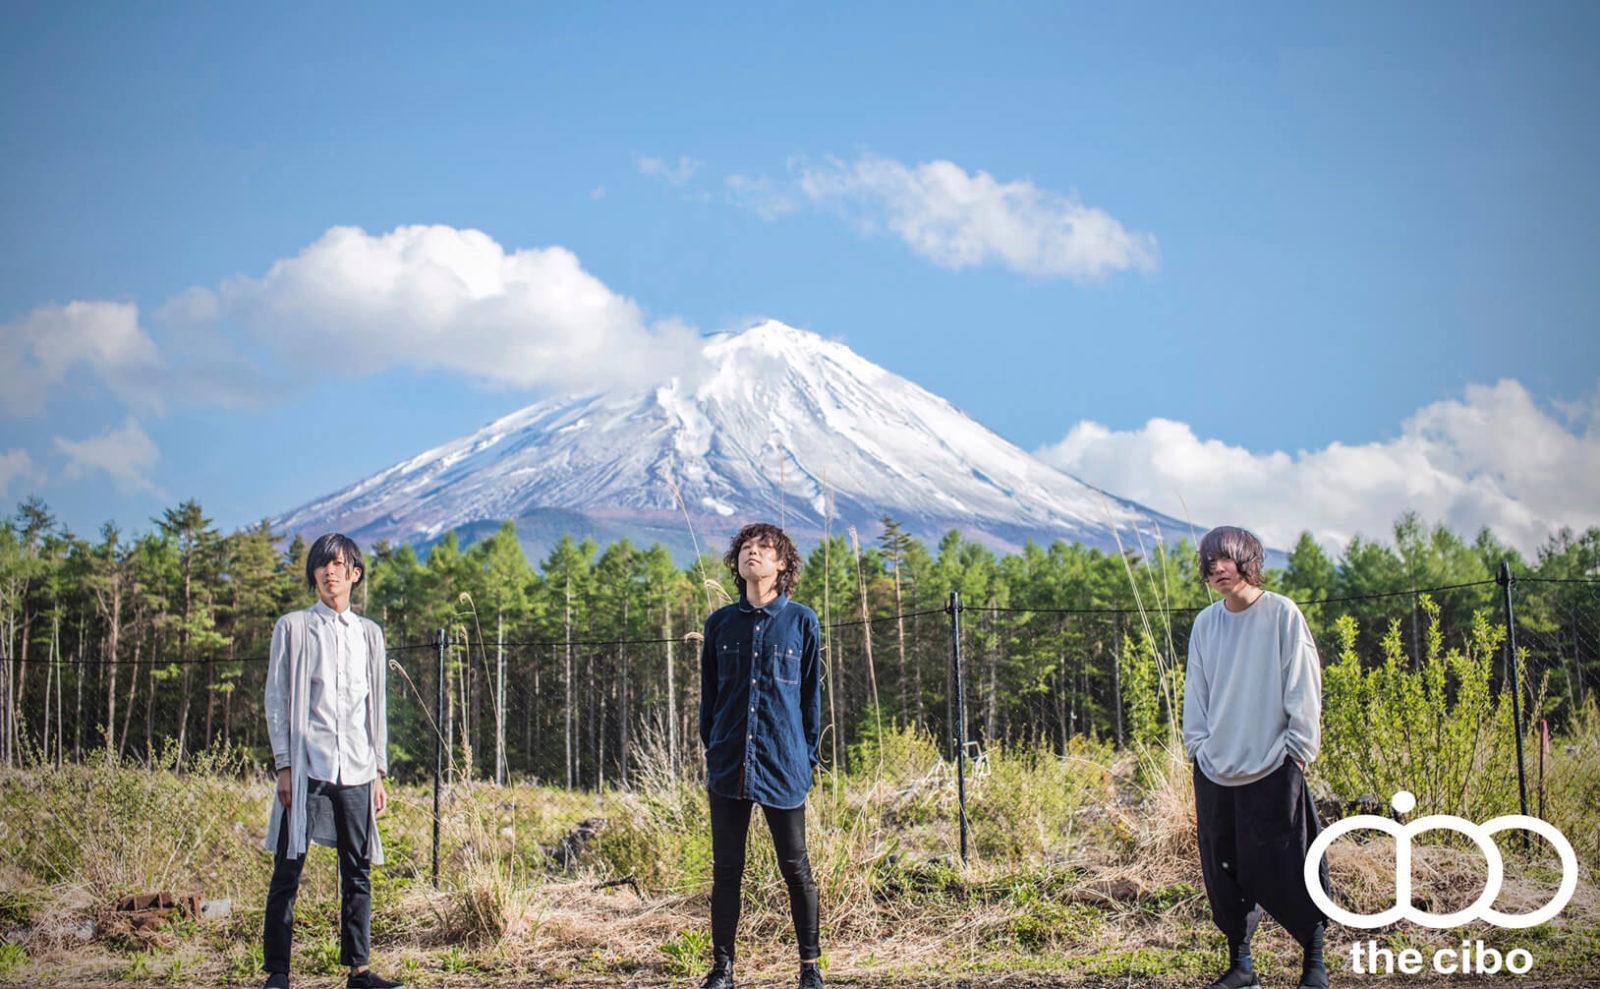 the cibo、1st Full Album「HOPES -a Lost World-」リリース決定&MV公開サムネイル画像